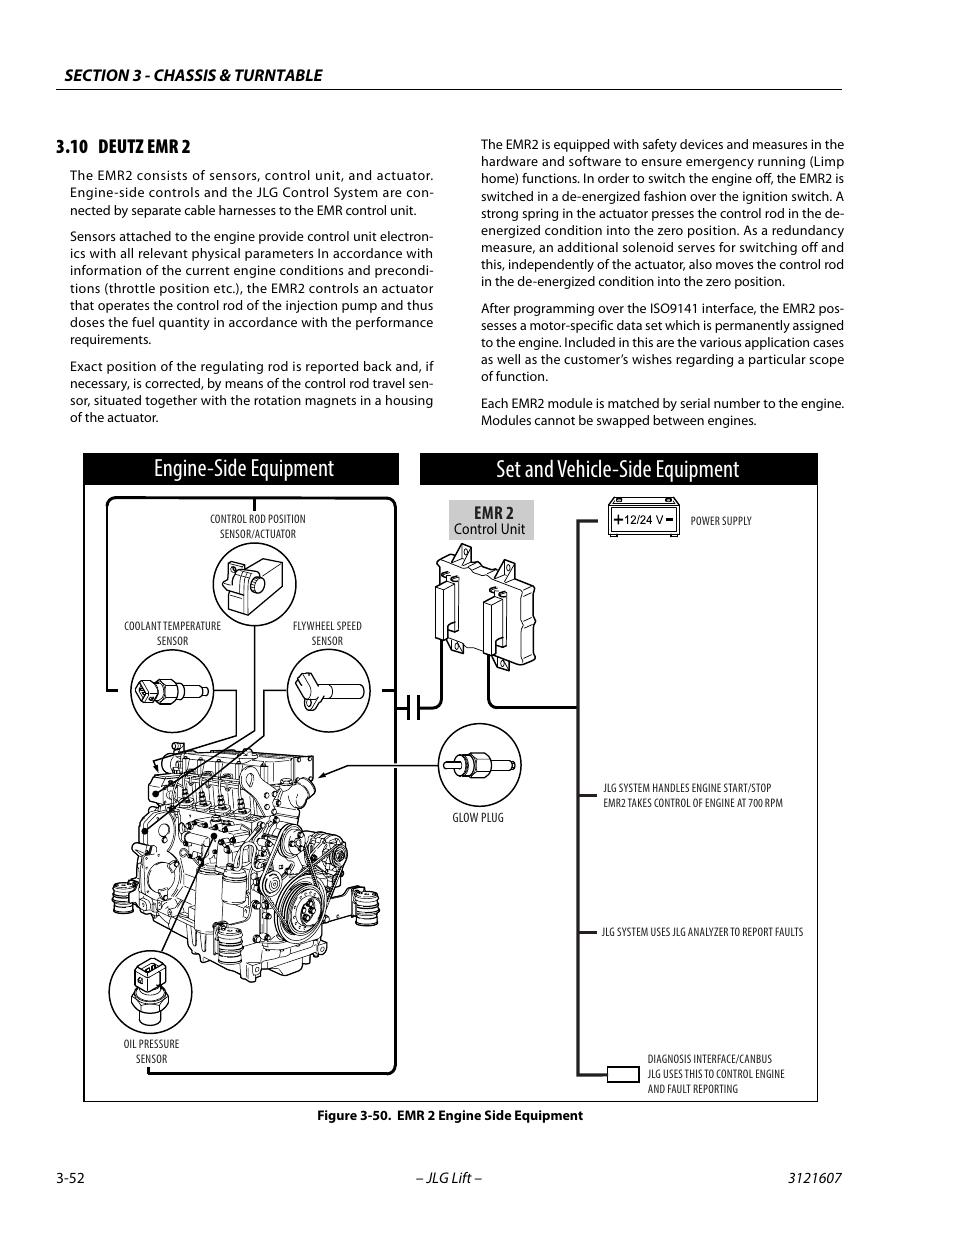 10 deutz emr 2 deutz emr 2 52 emr 2 engine side equipment 52 rh manualsdir com Deutz Tractor Manuals Deutz Engine Parts Manual